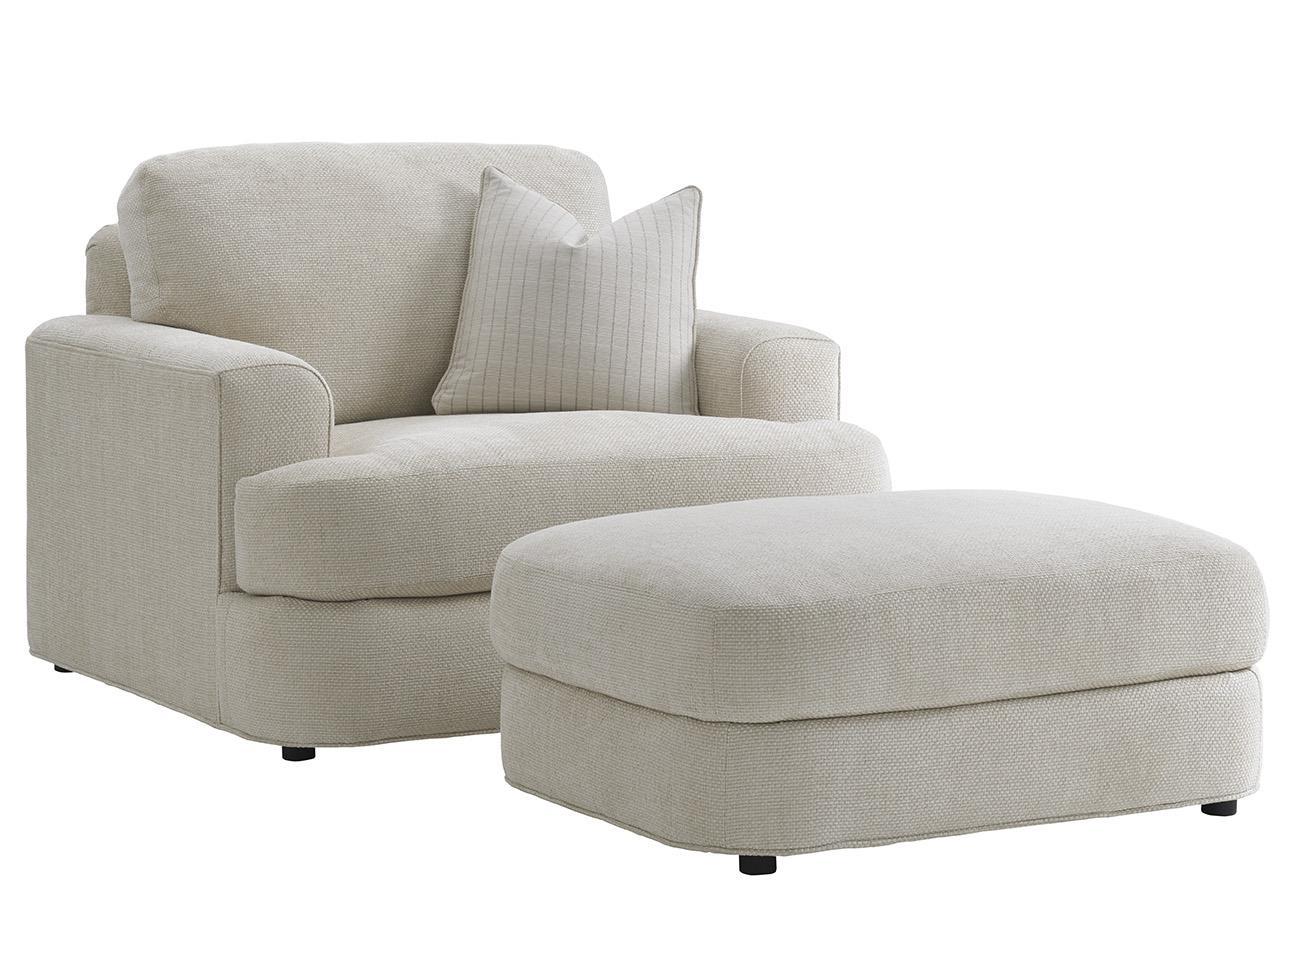 Halandale Chair and Ottoman Set